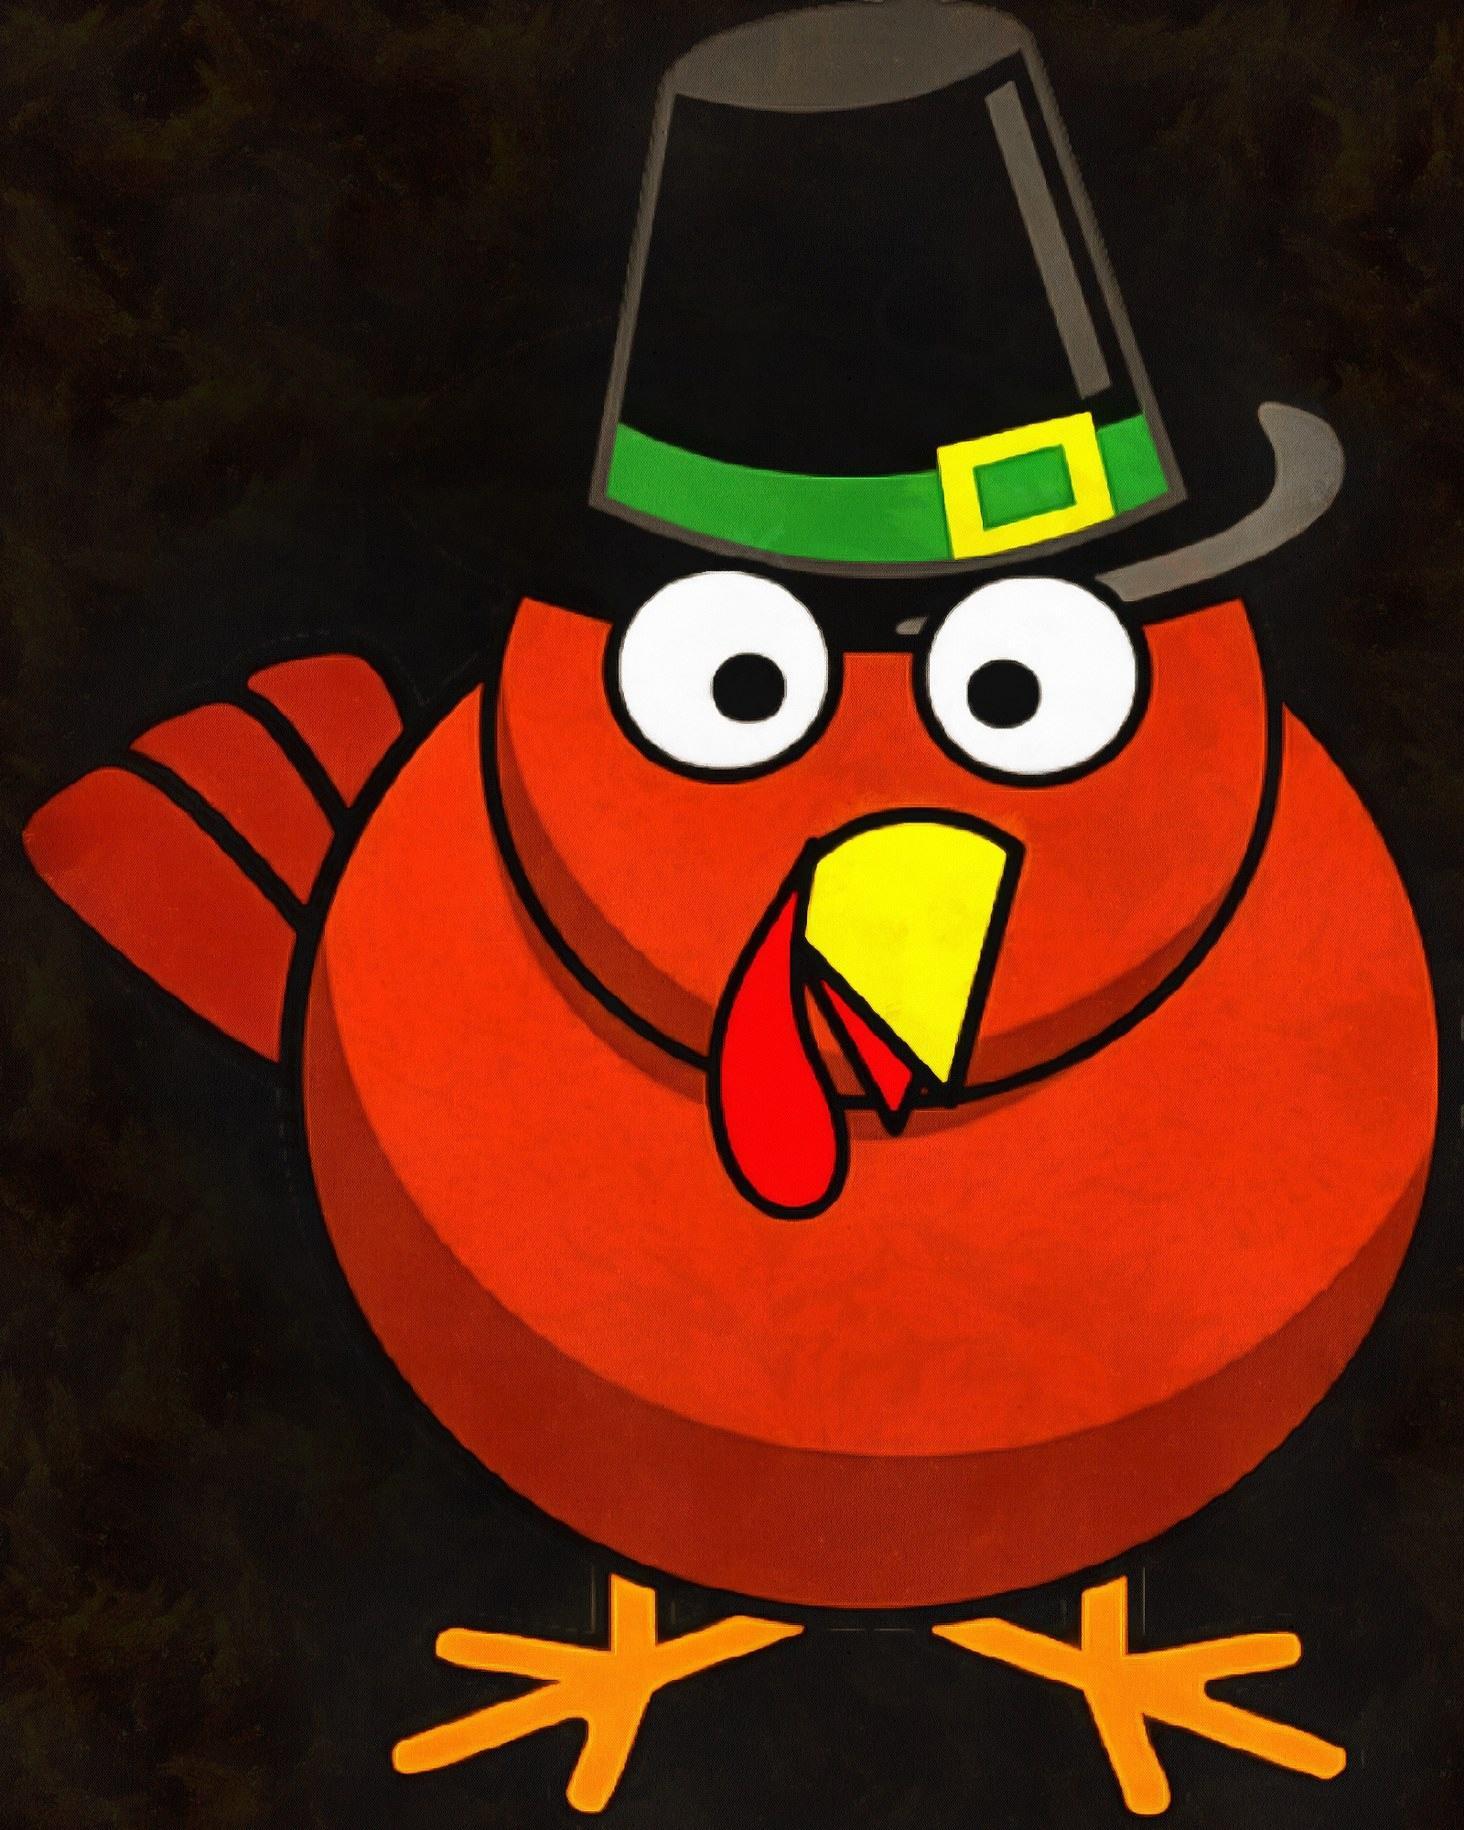 thanksgiving, turkey, live turkey, bird, holiday, Thanksgiving Day,   - thanksgiving, stock free image, public domain photos, free stock photo, download public domain images.